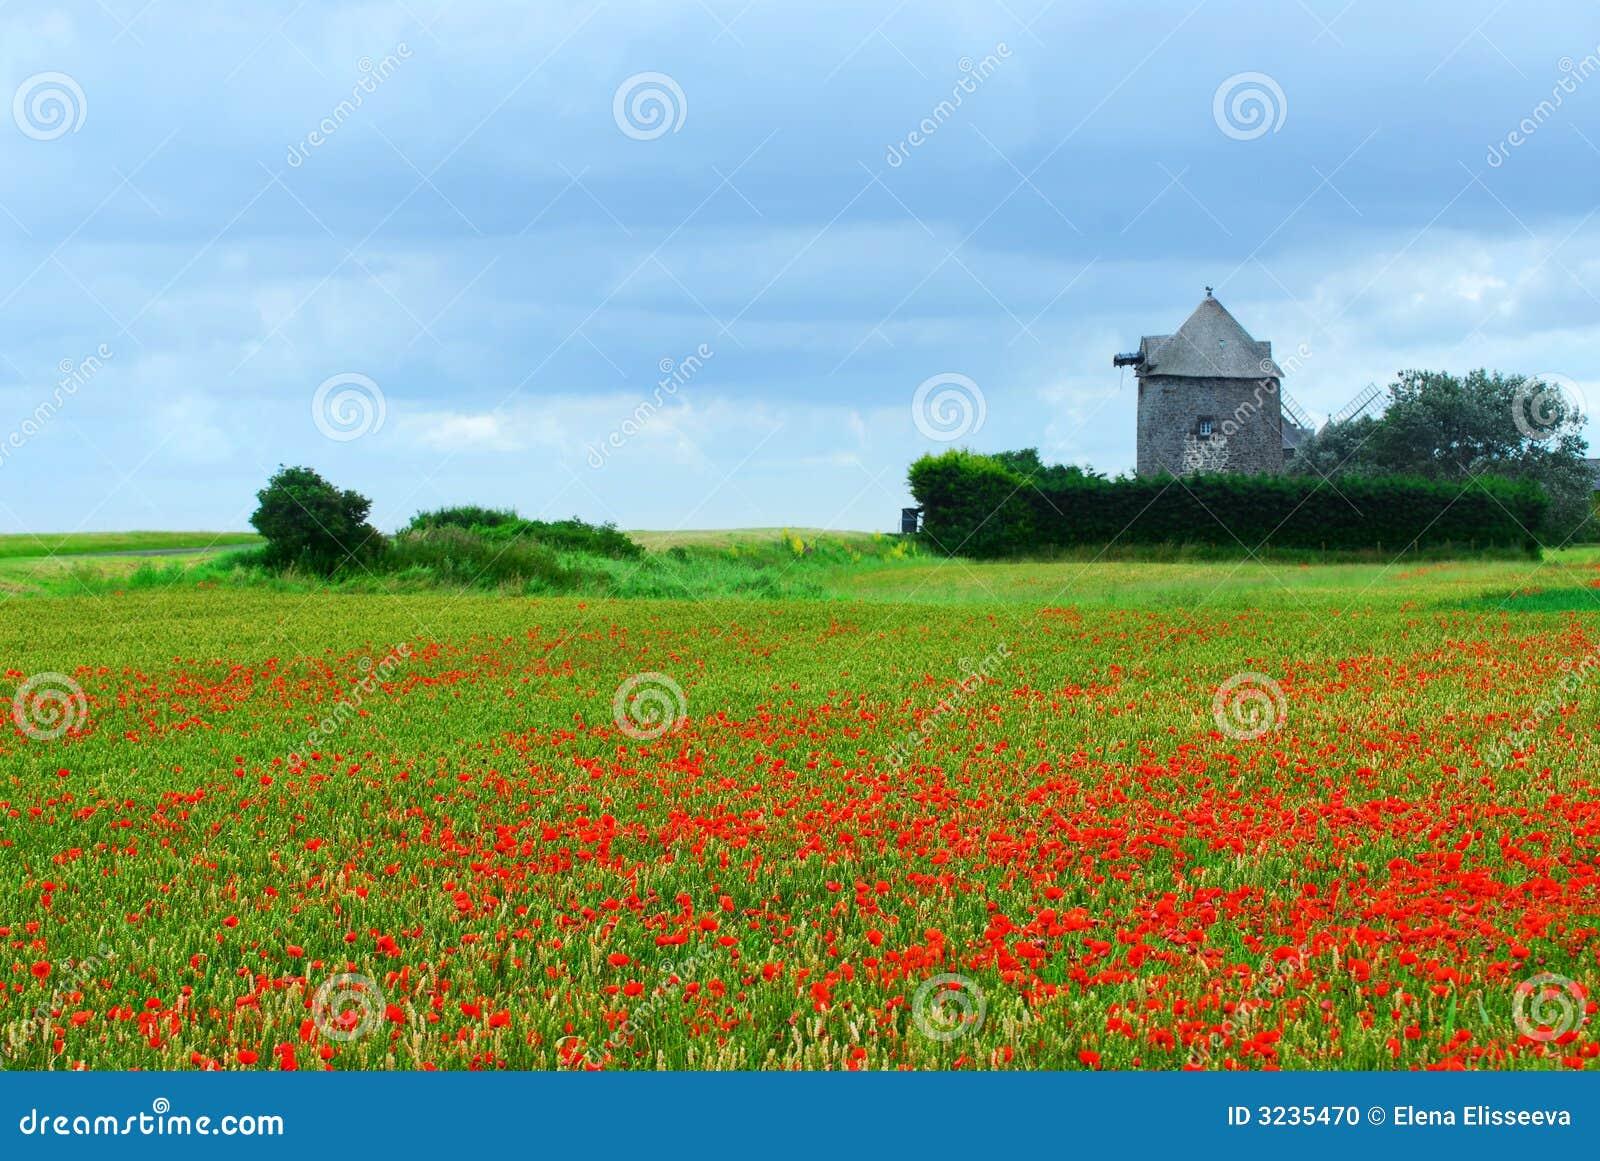 Windmill and poppy field